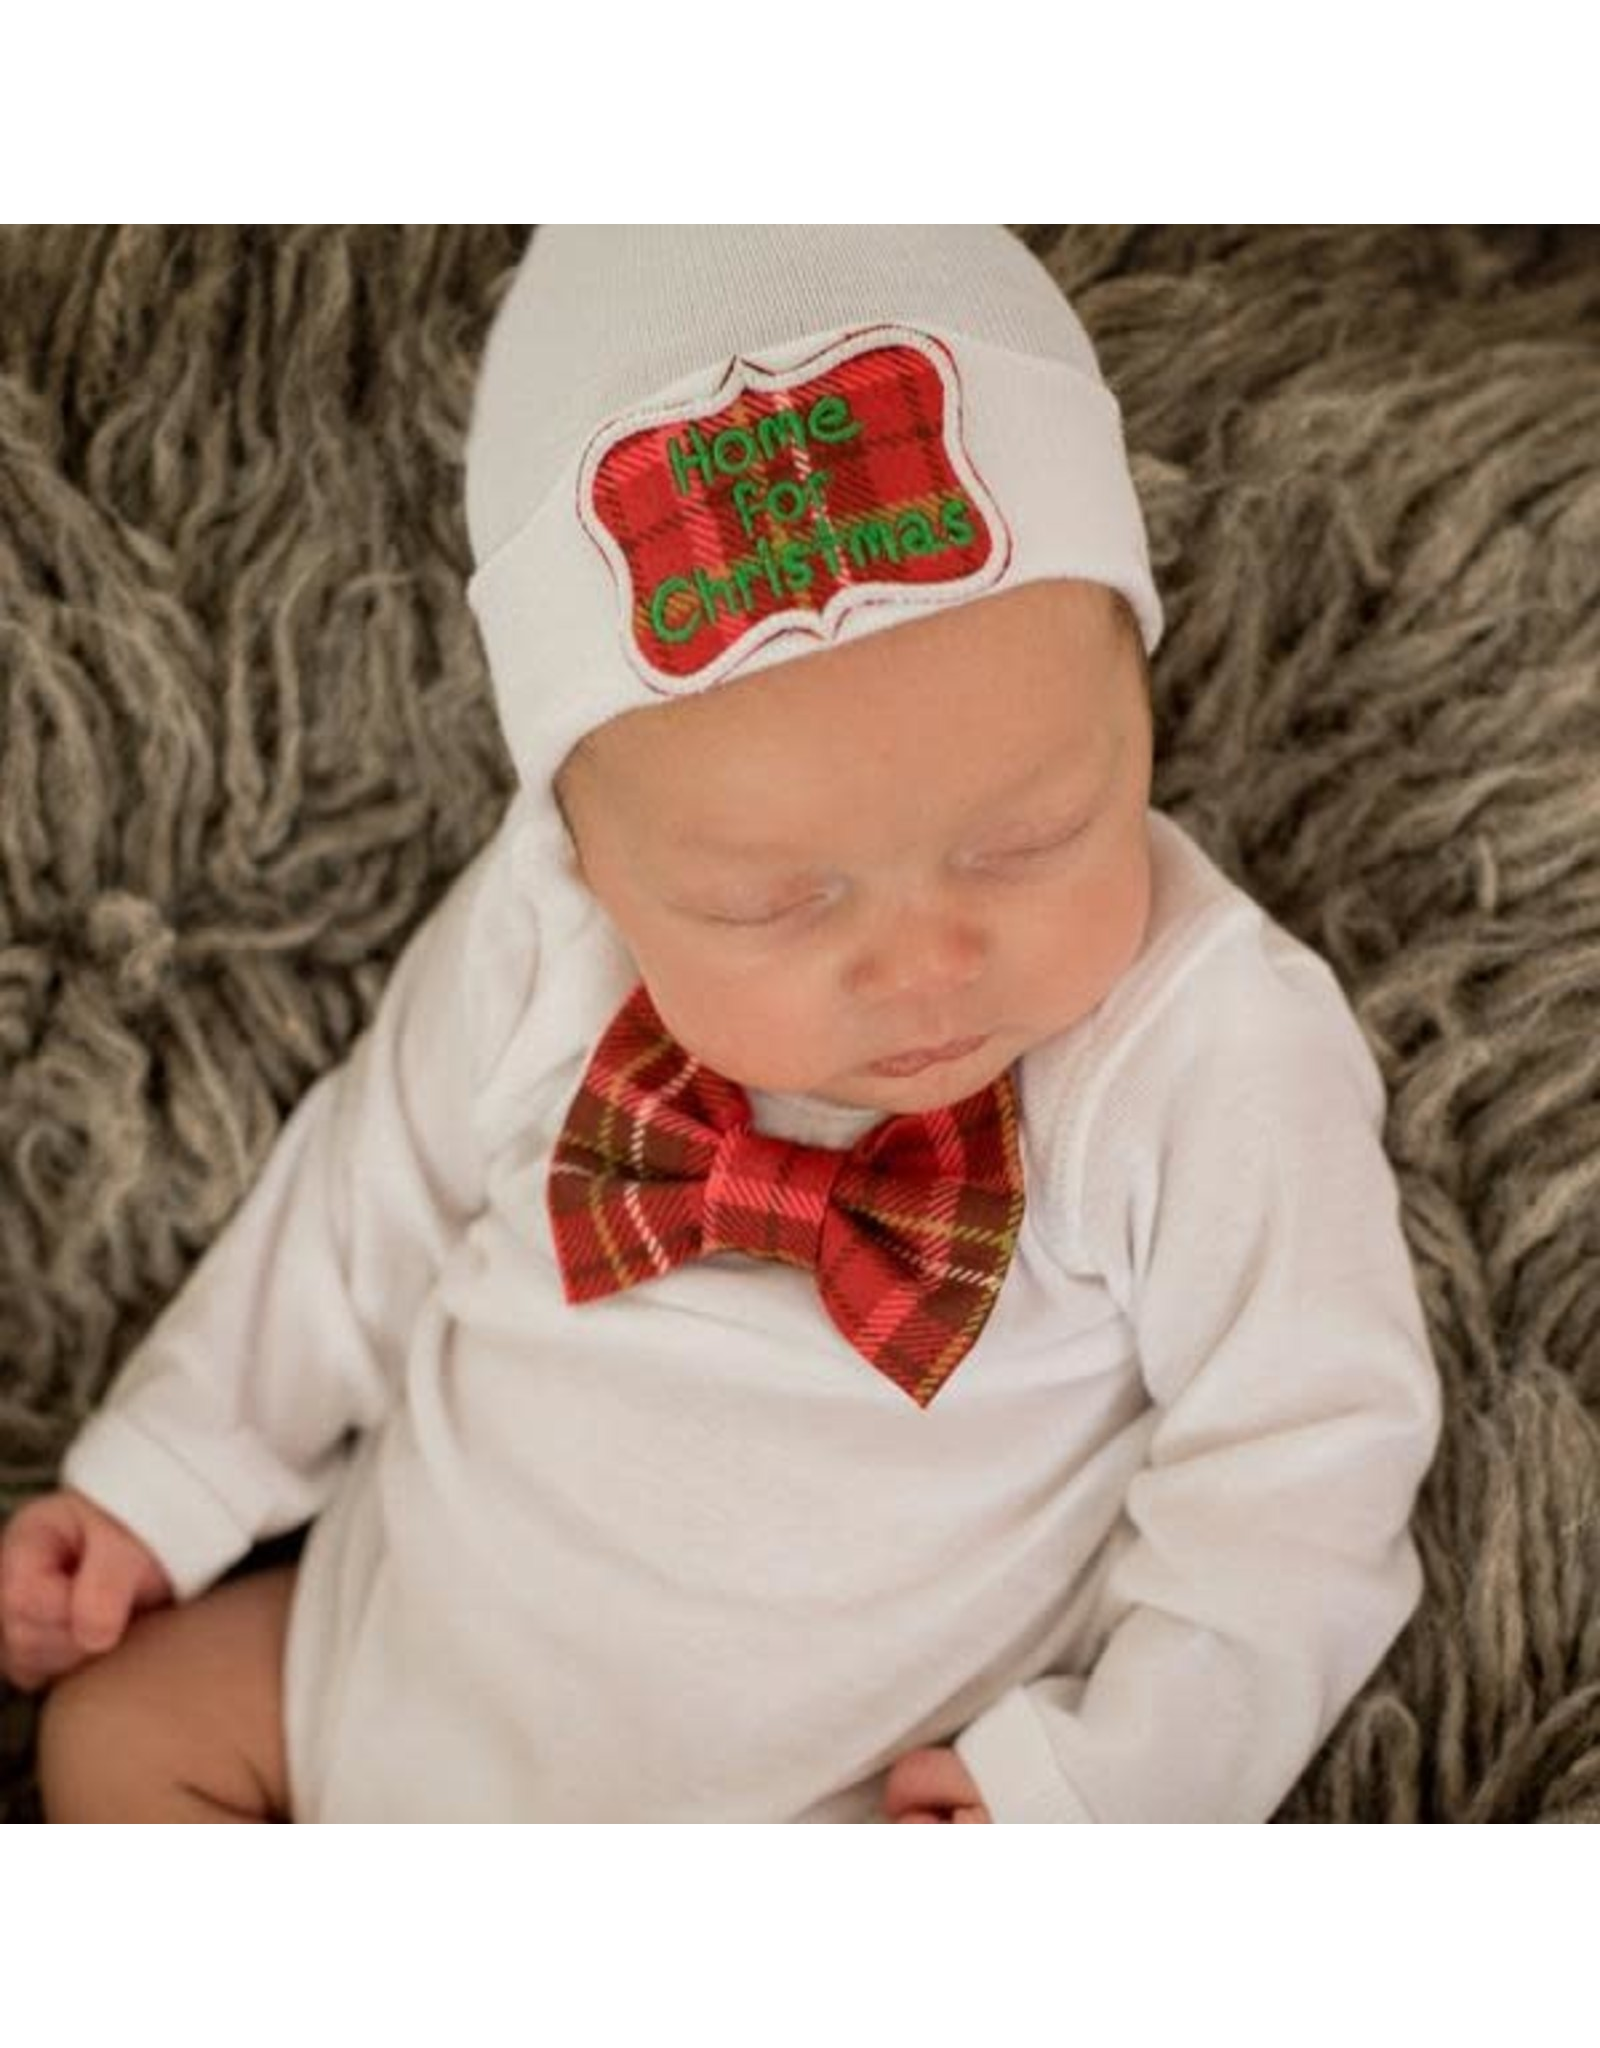 ILYBEAN Ily Bean- Home for Christmas Newborn Set